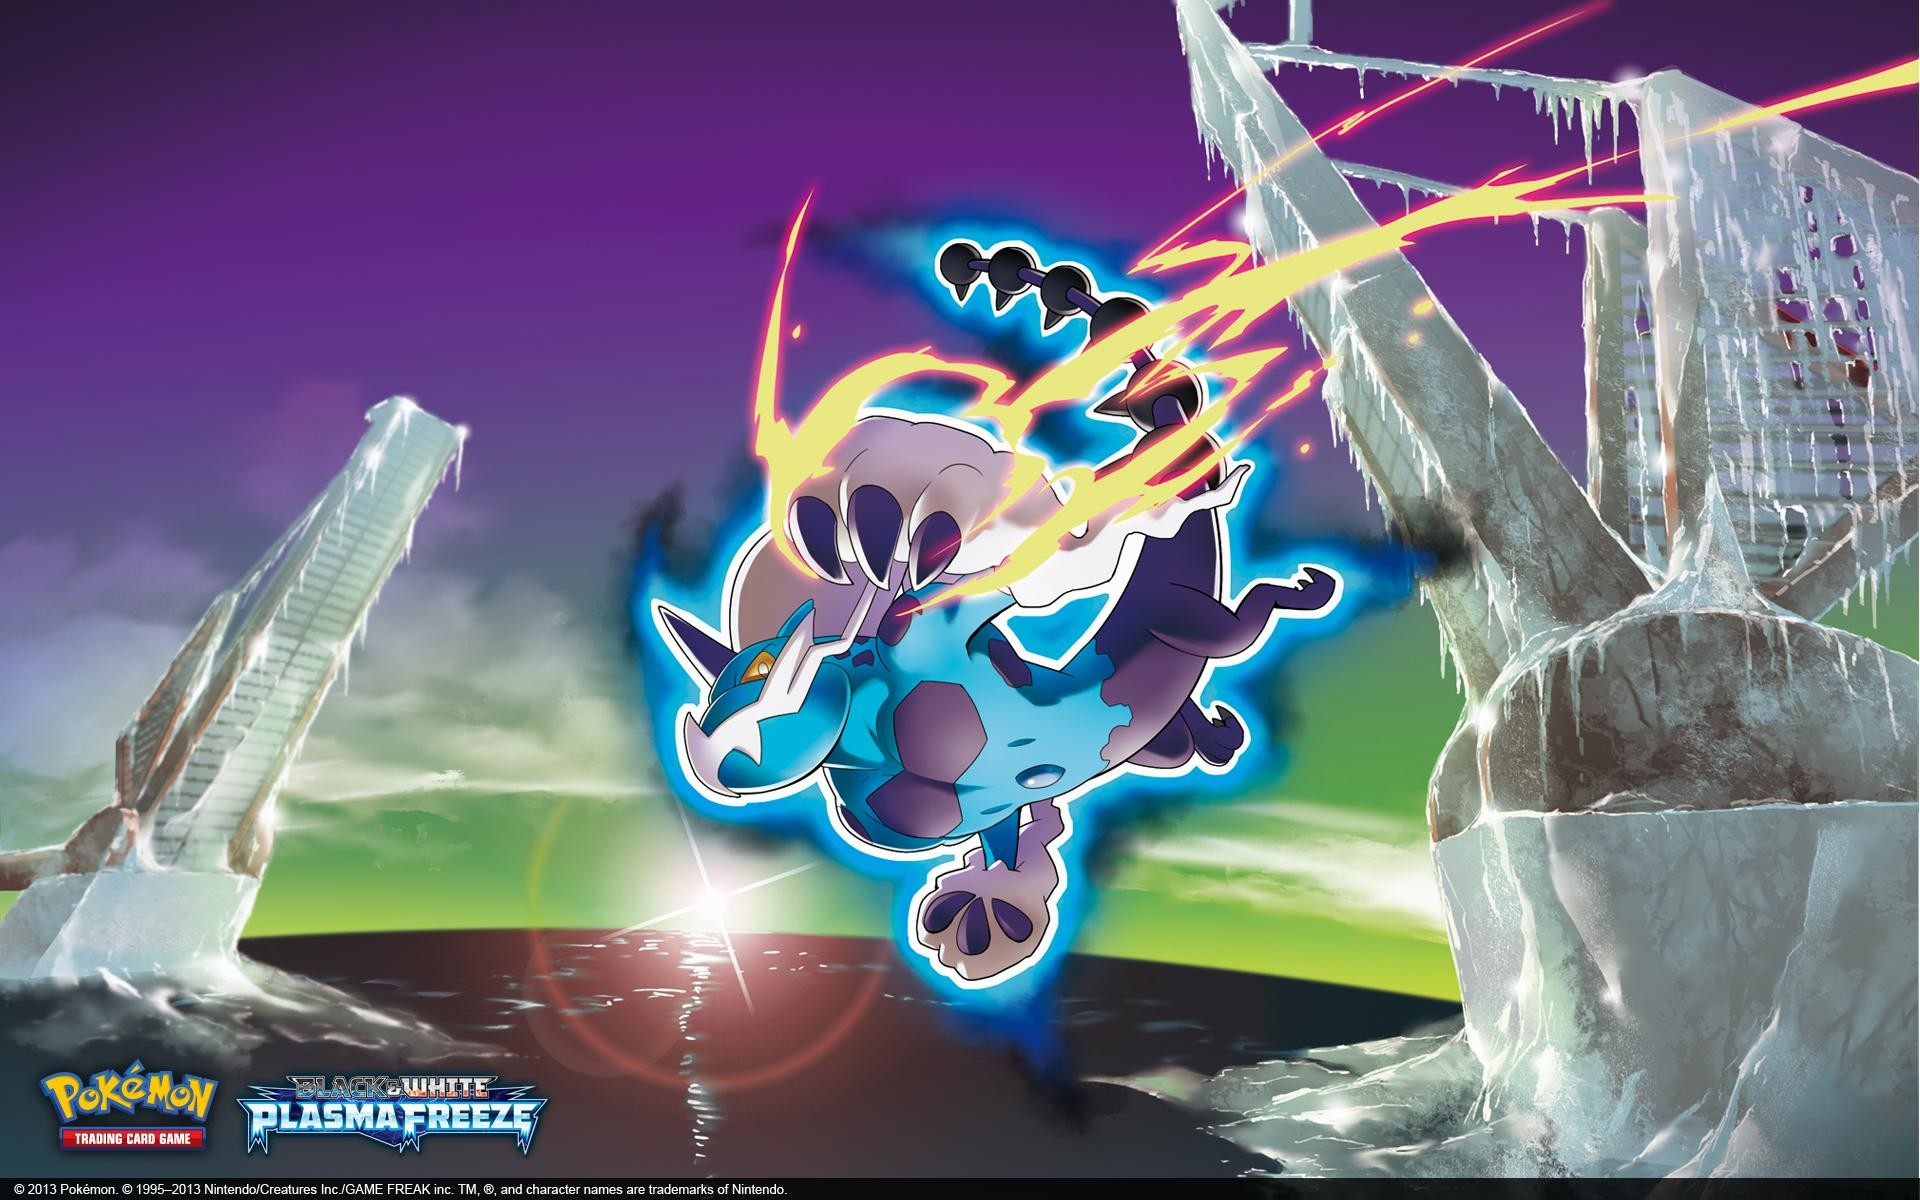 Pokemon-Black-and-White-Desktop-Computer-Background-1